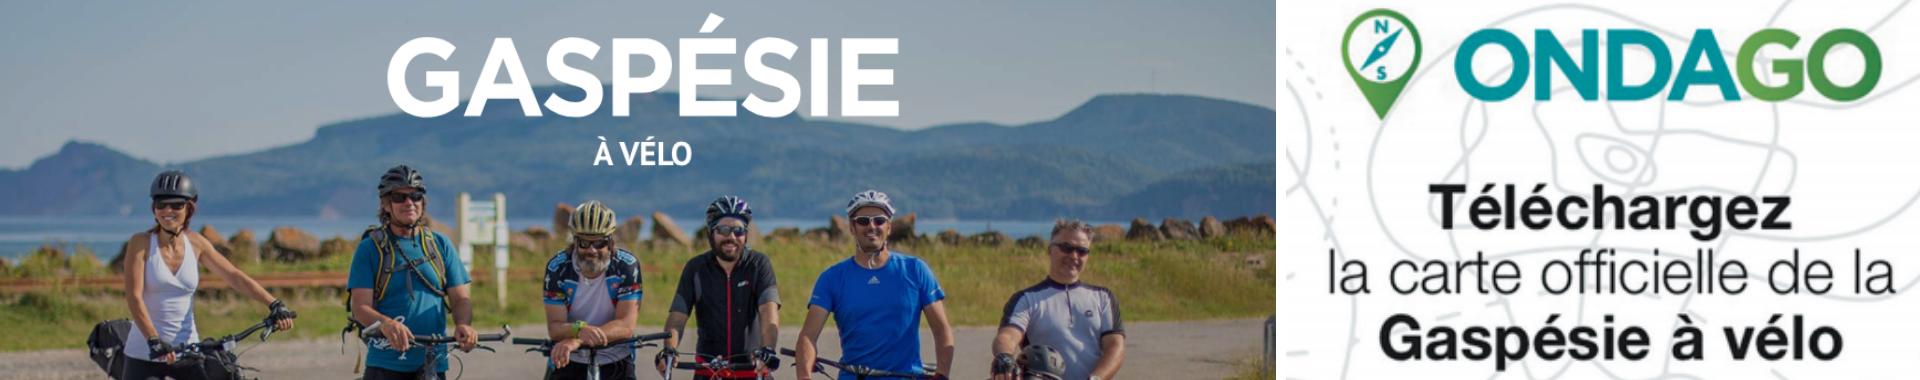 Gaspésie-vélo-cyclotourisme-fatbike-velo-de-montagne